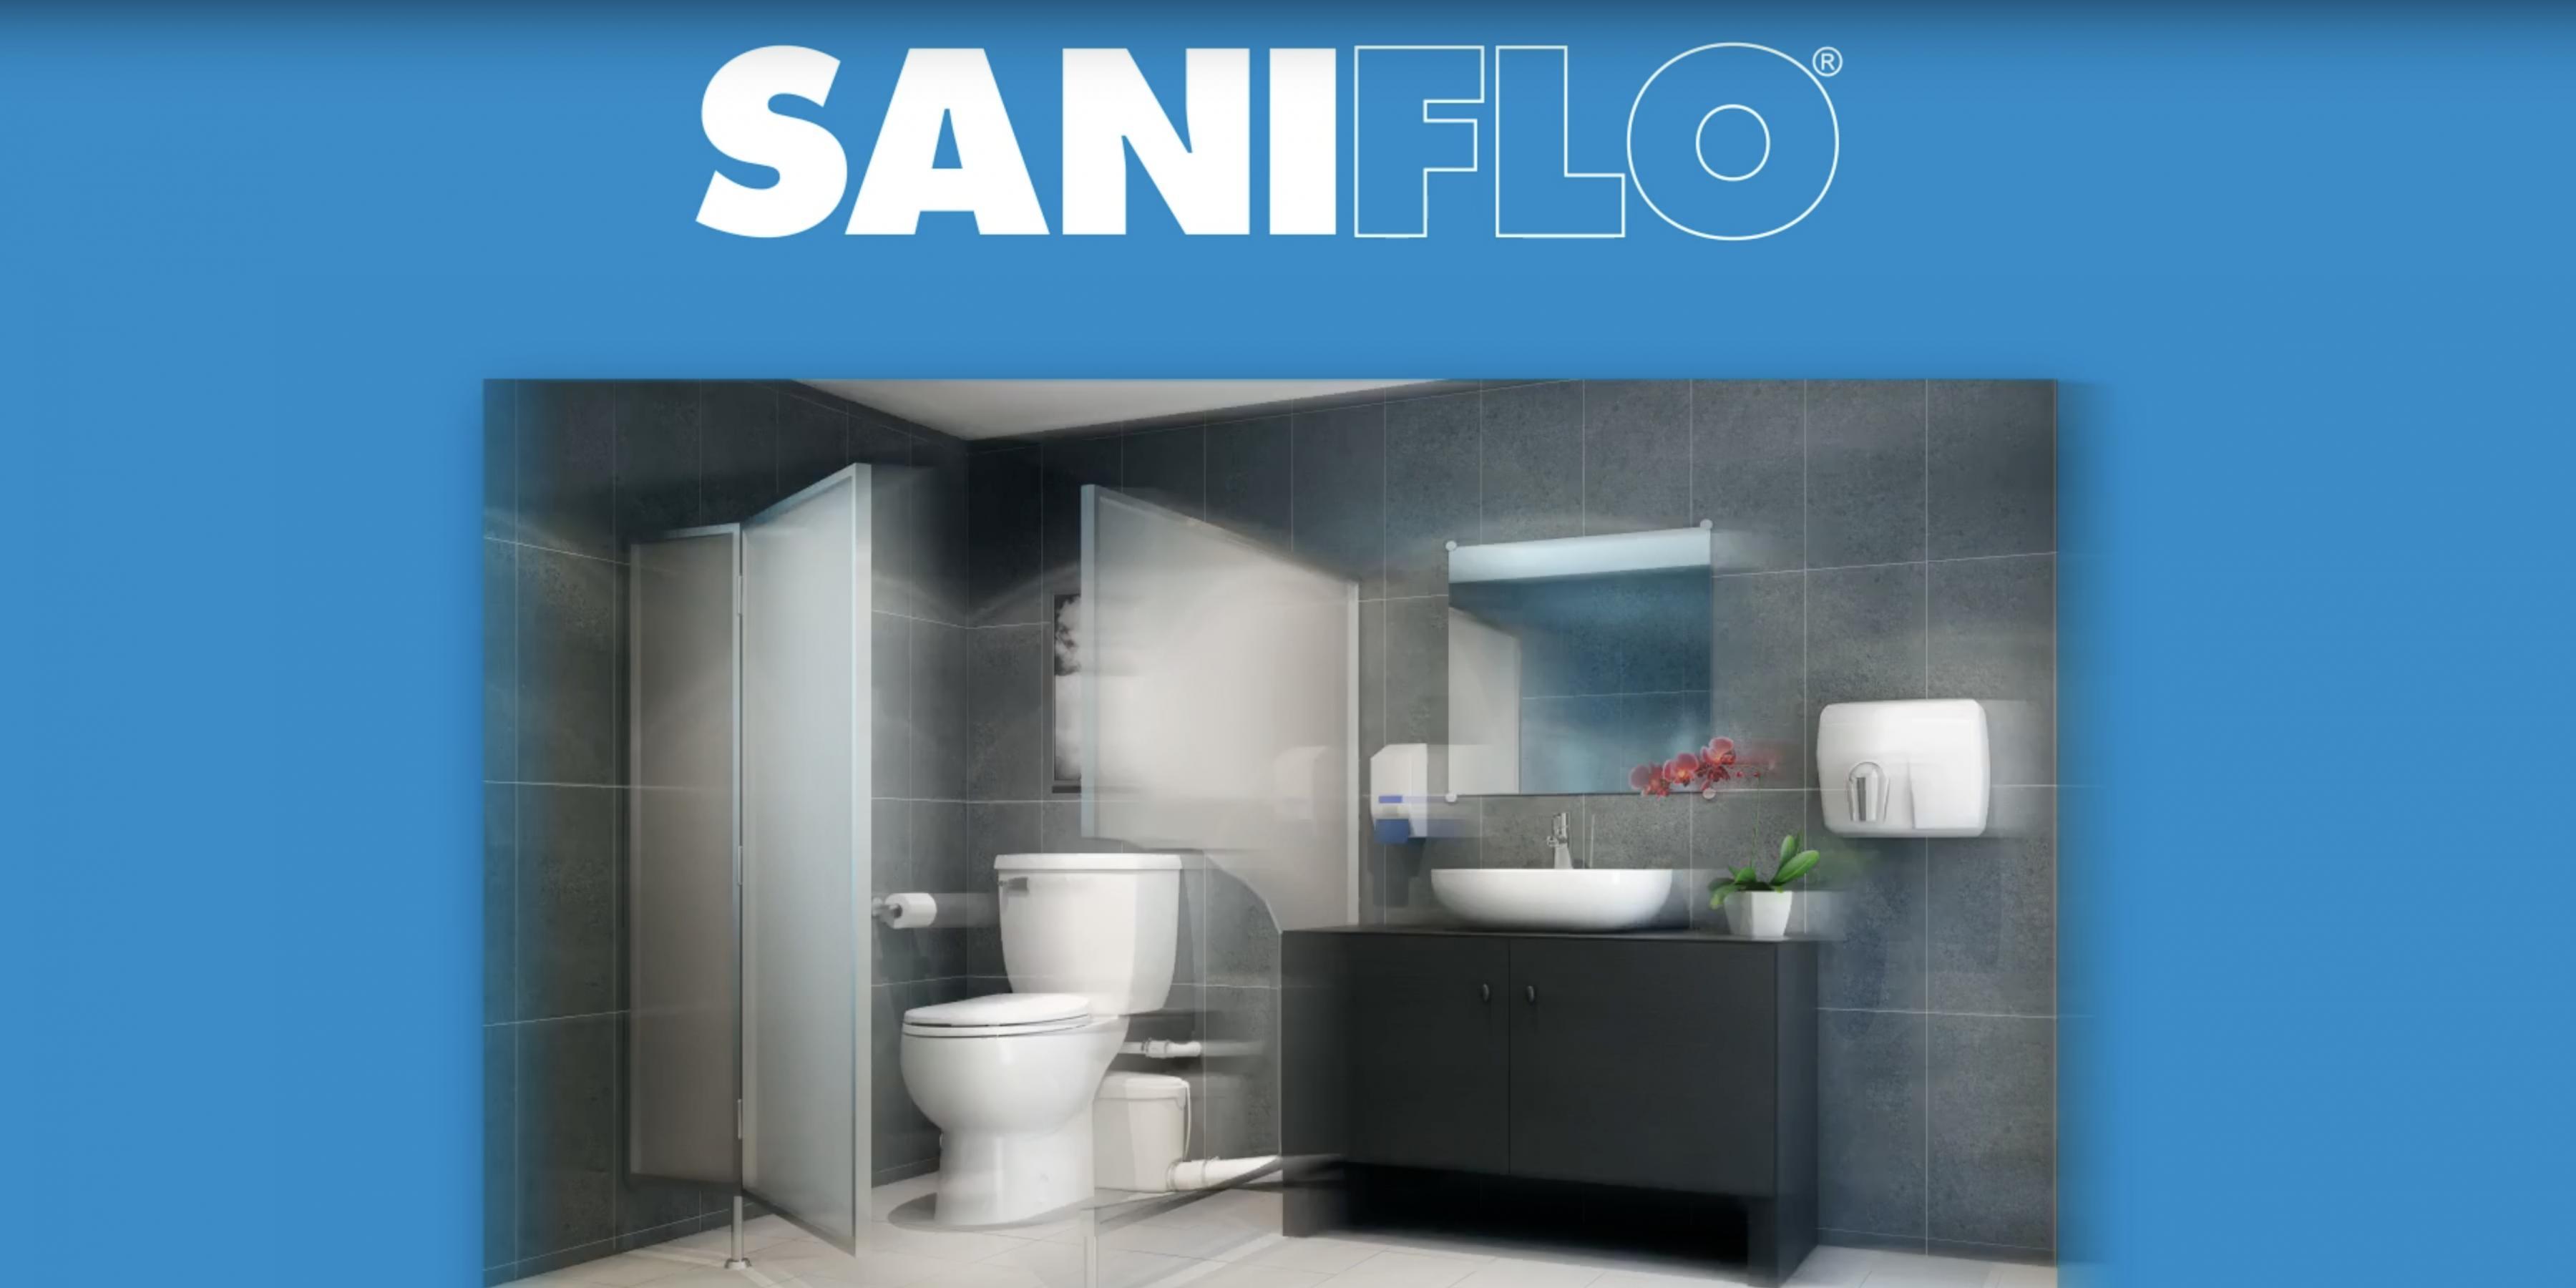 SANIFLO® Product Installation 101